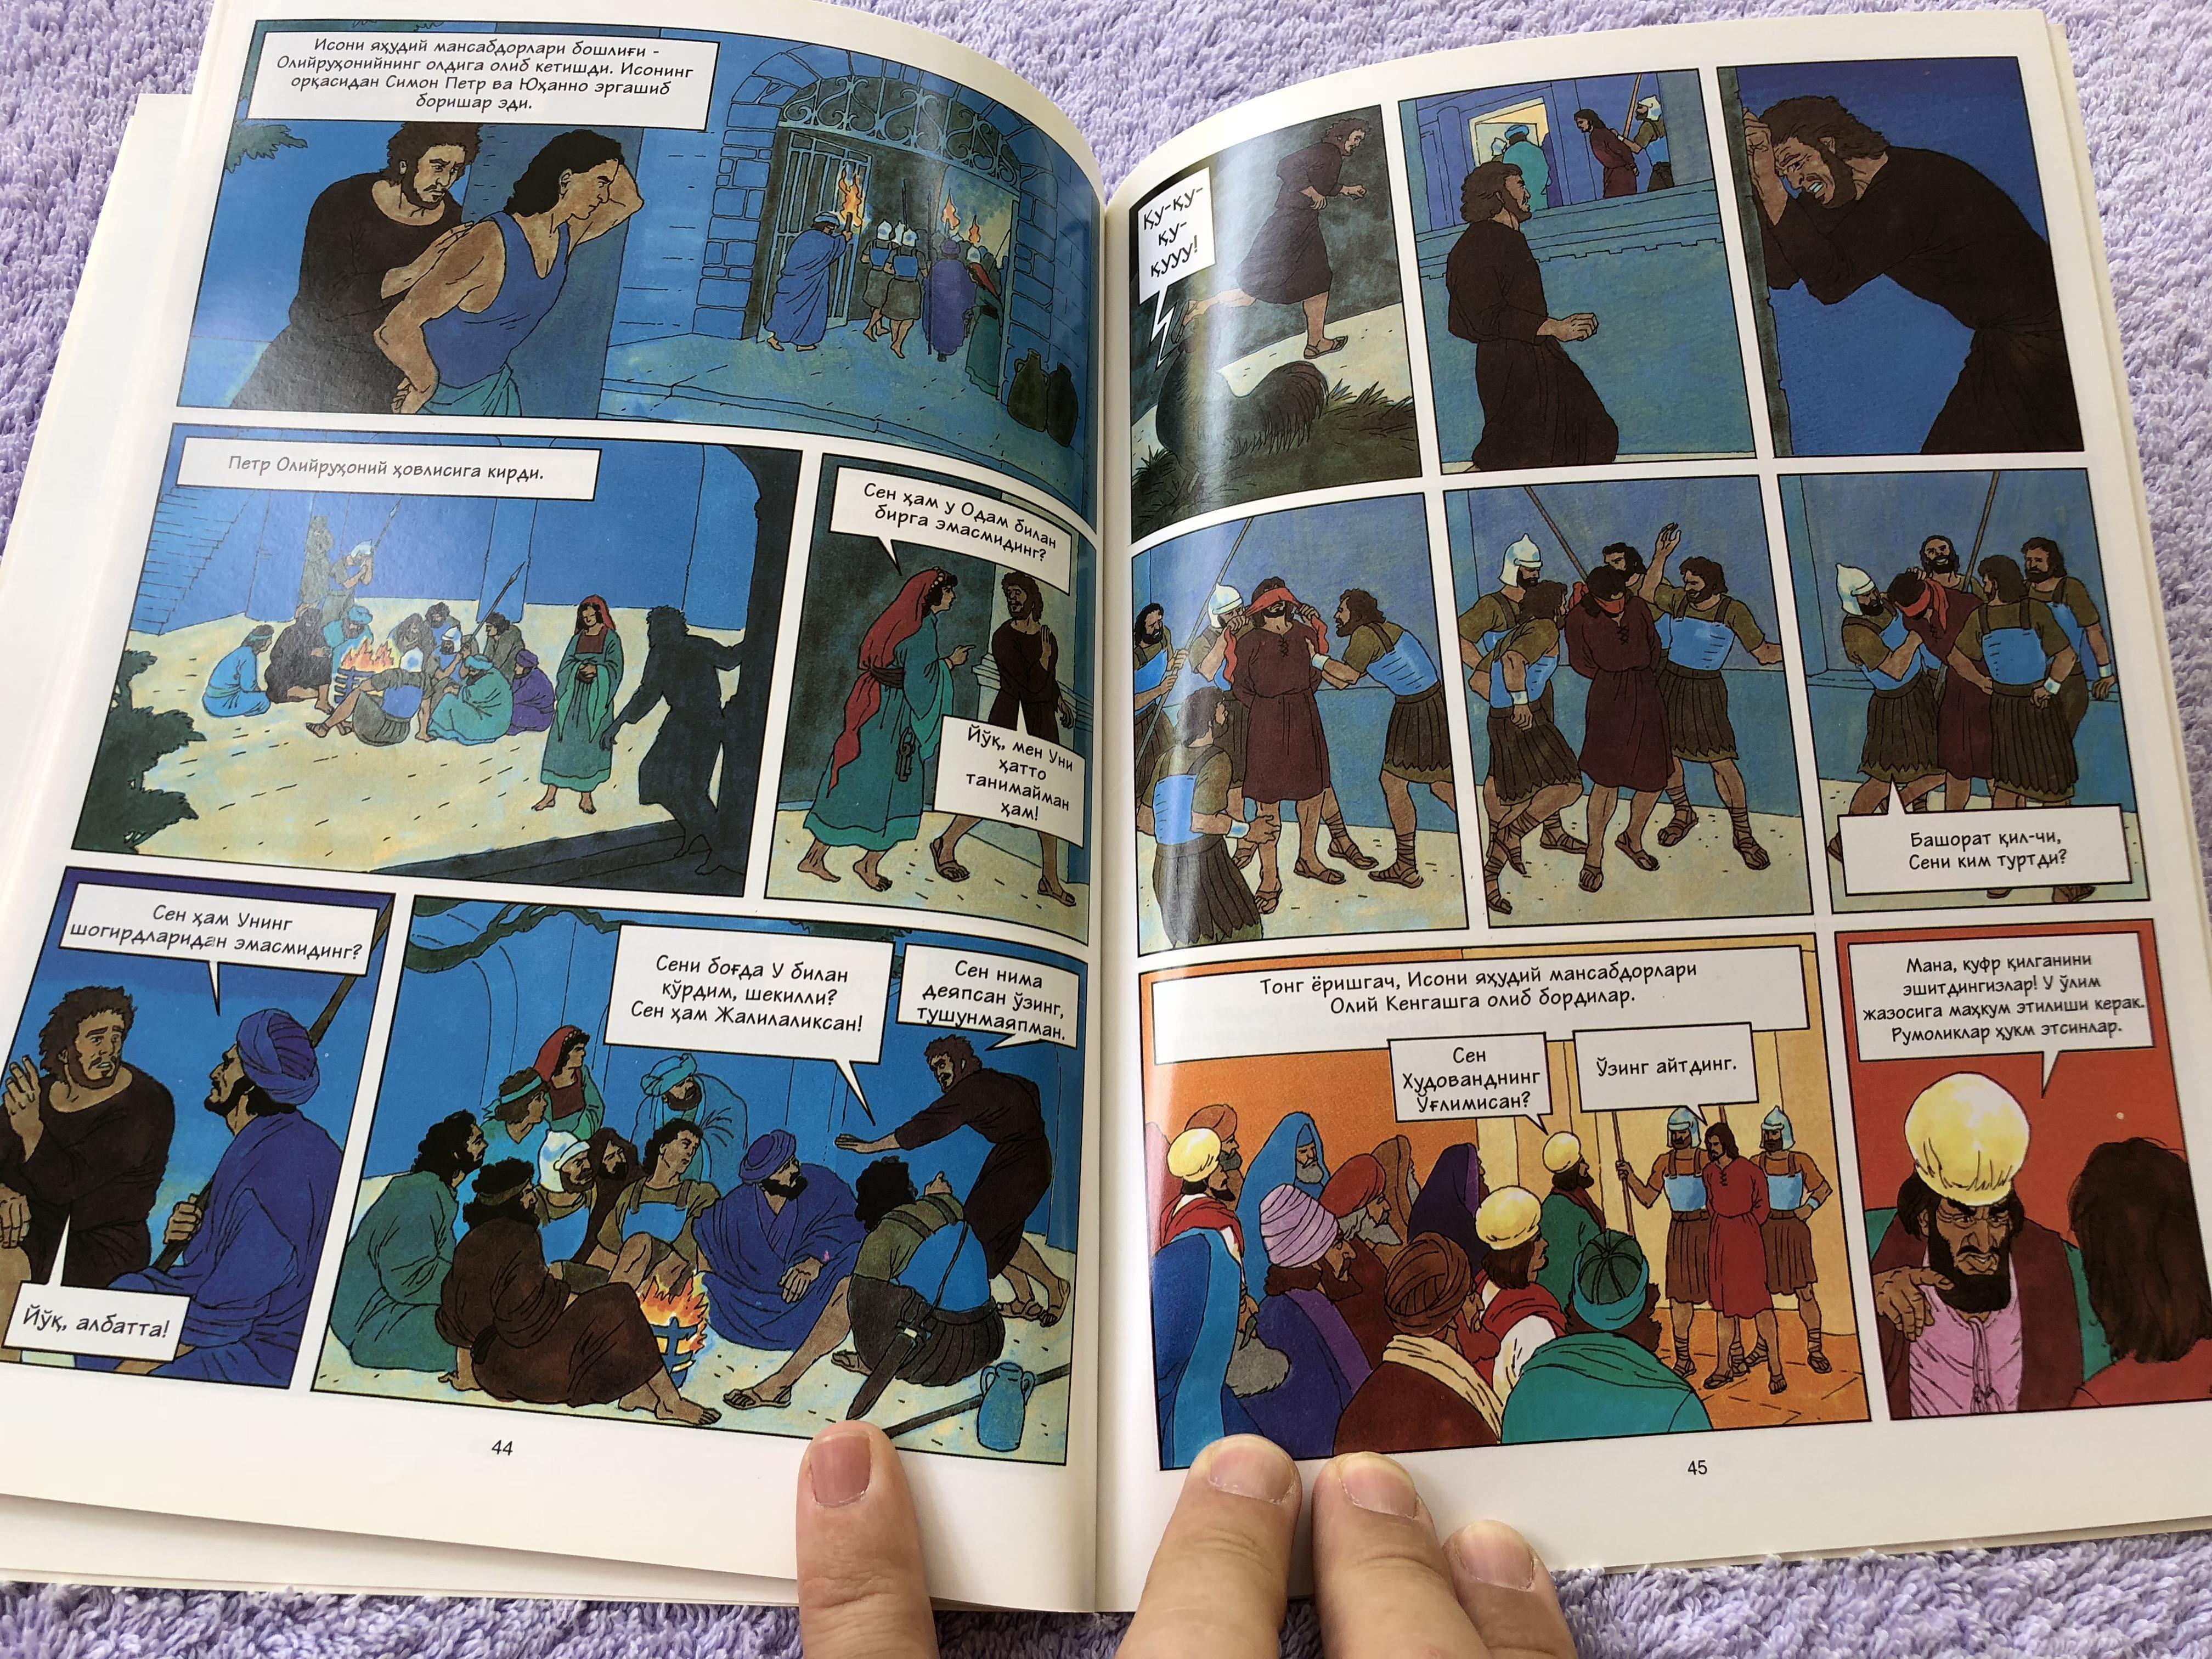 iso-mashi-uzbek-comic-strip-bible-10-.jpg